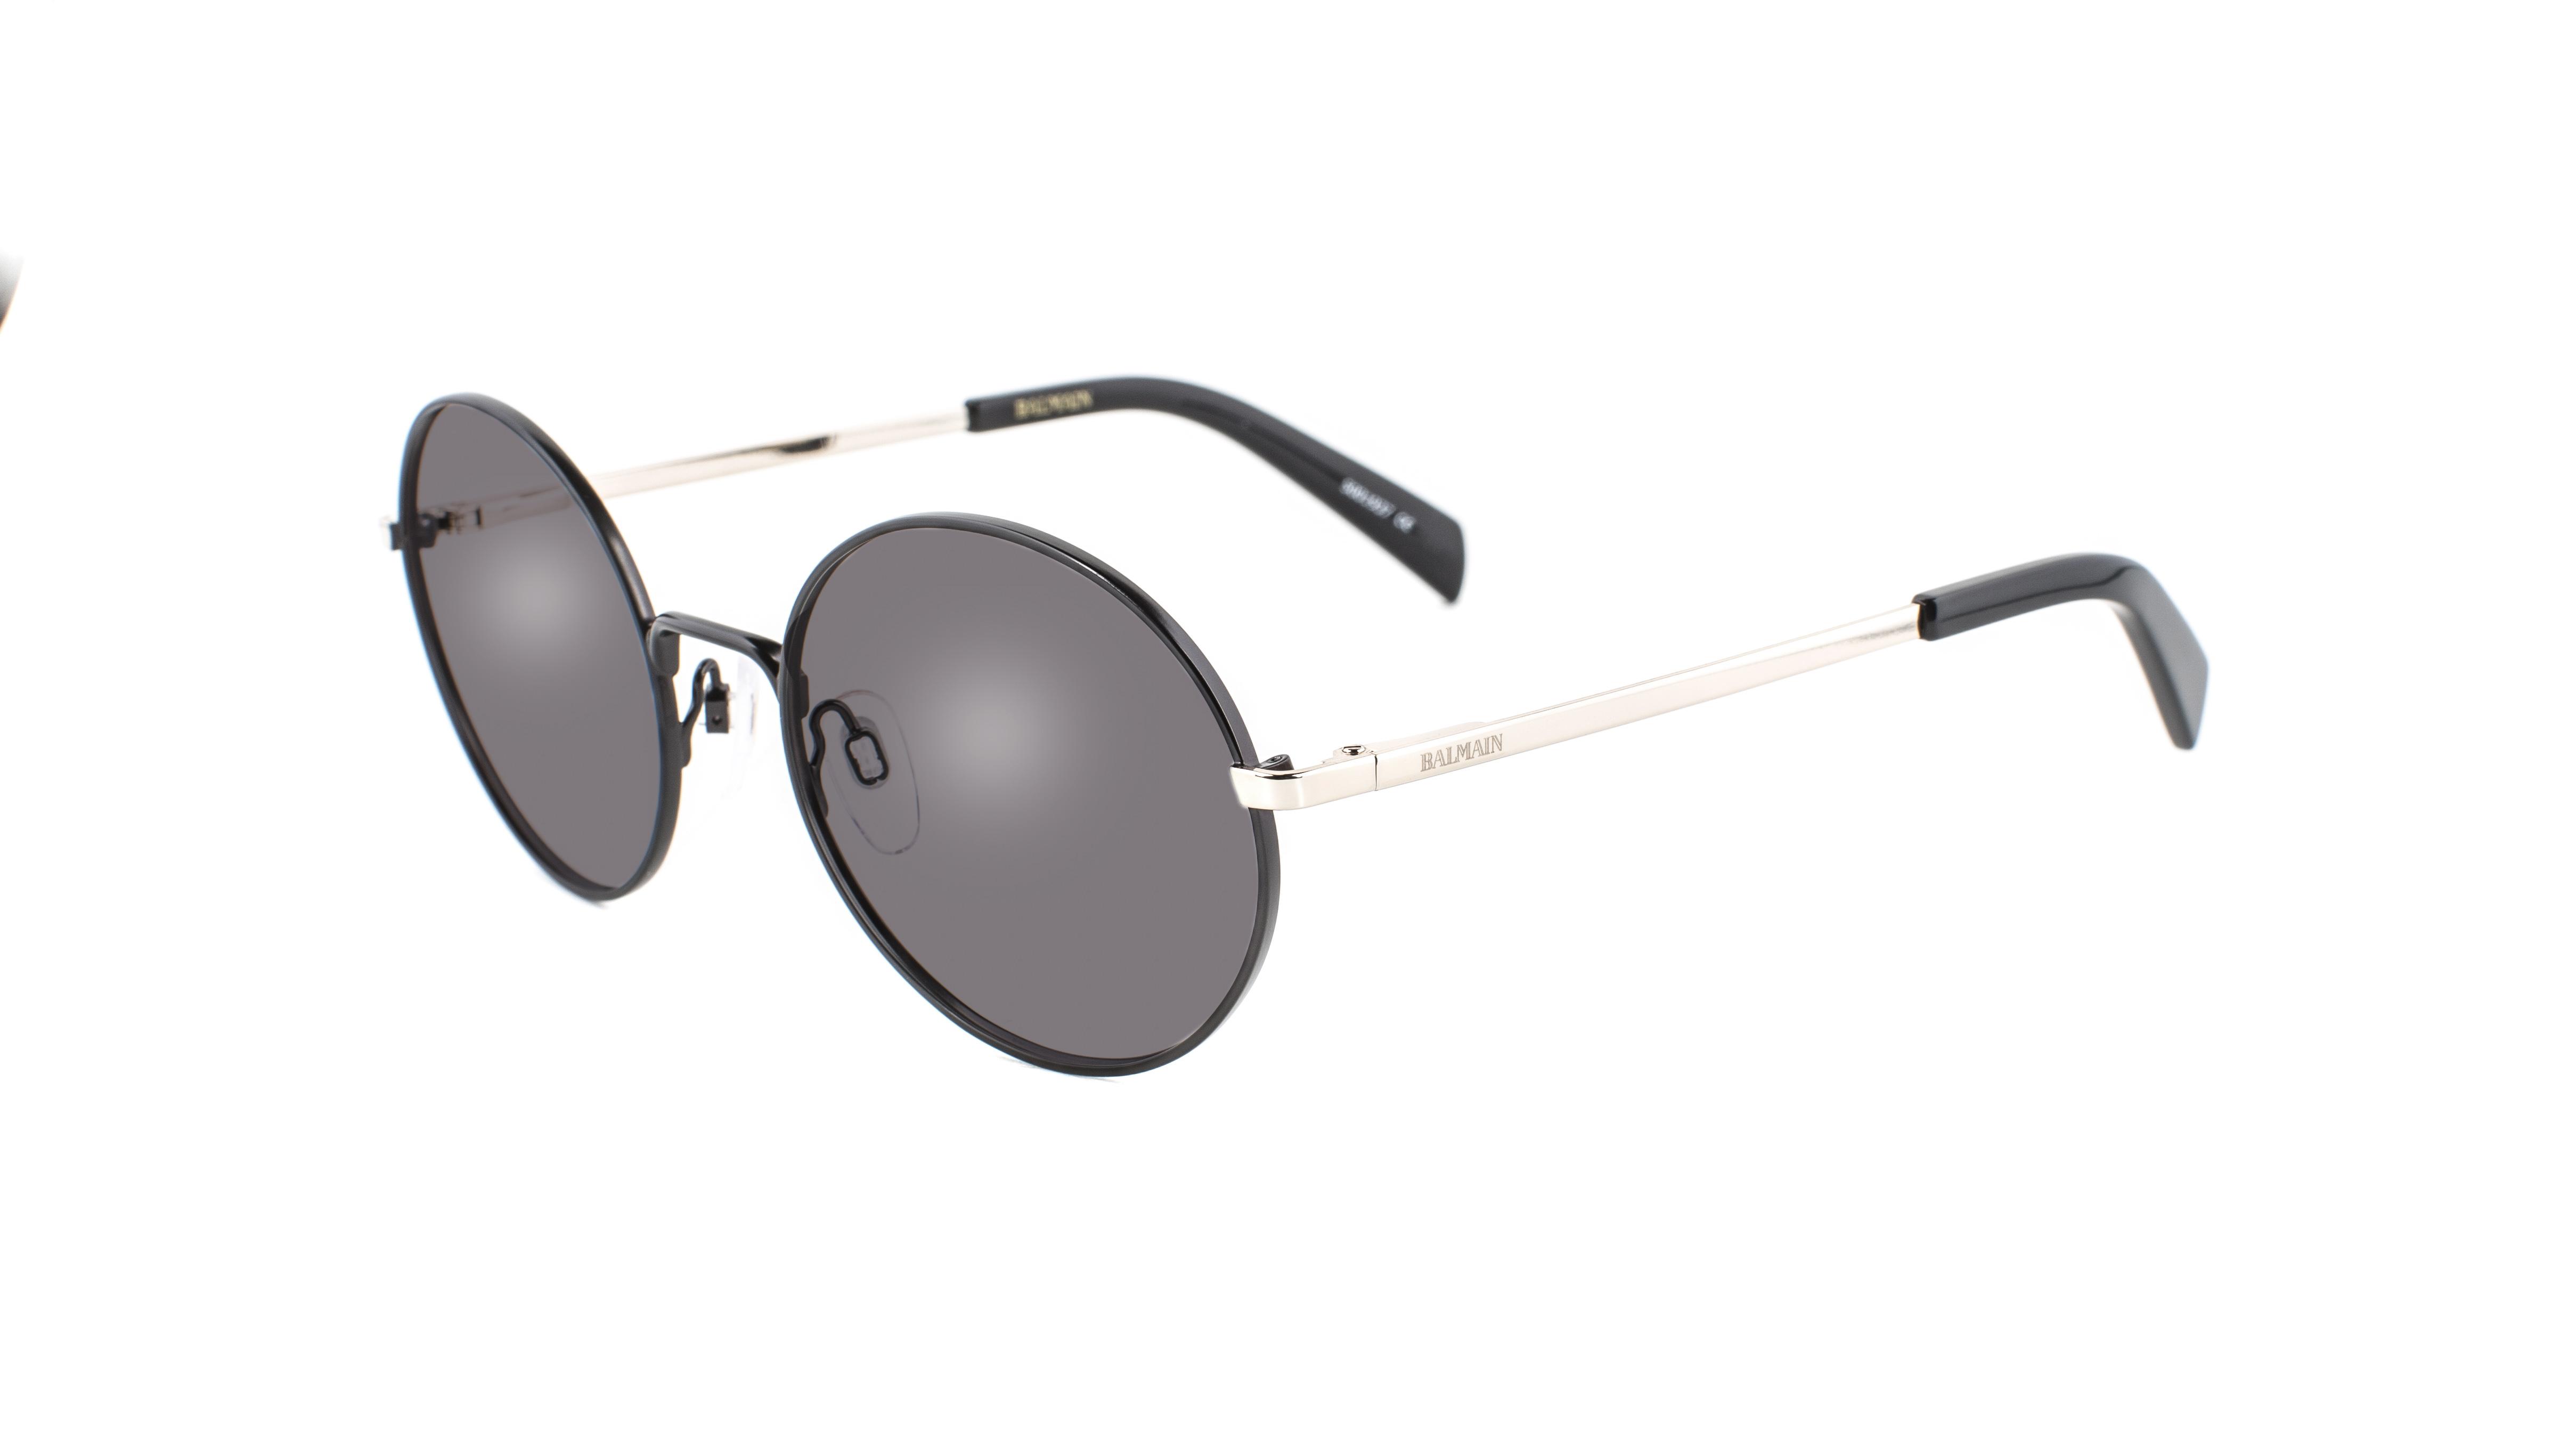 Balmain x Specsavers BL1503 SUN RX 30570627 - RRP 2 pairs single vision $459